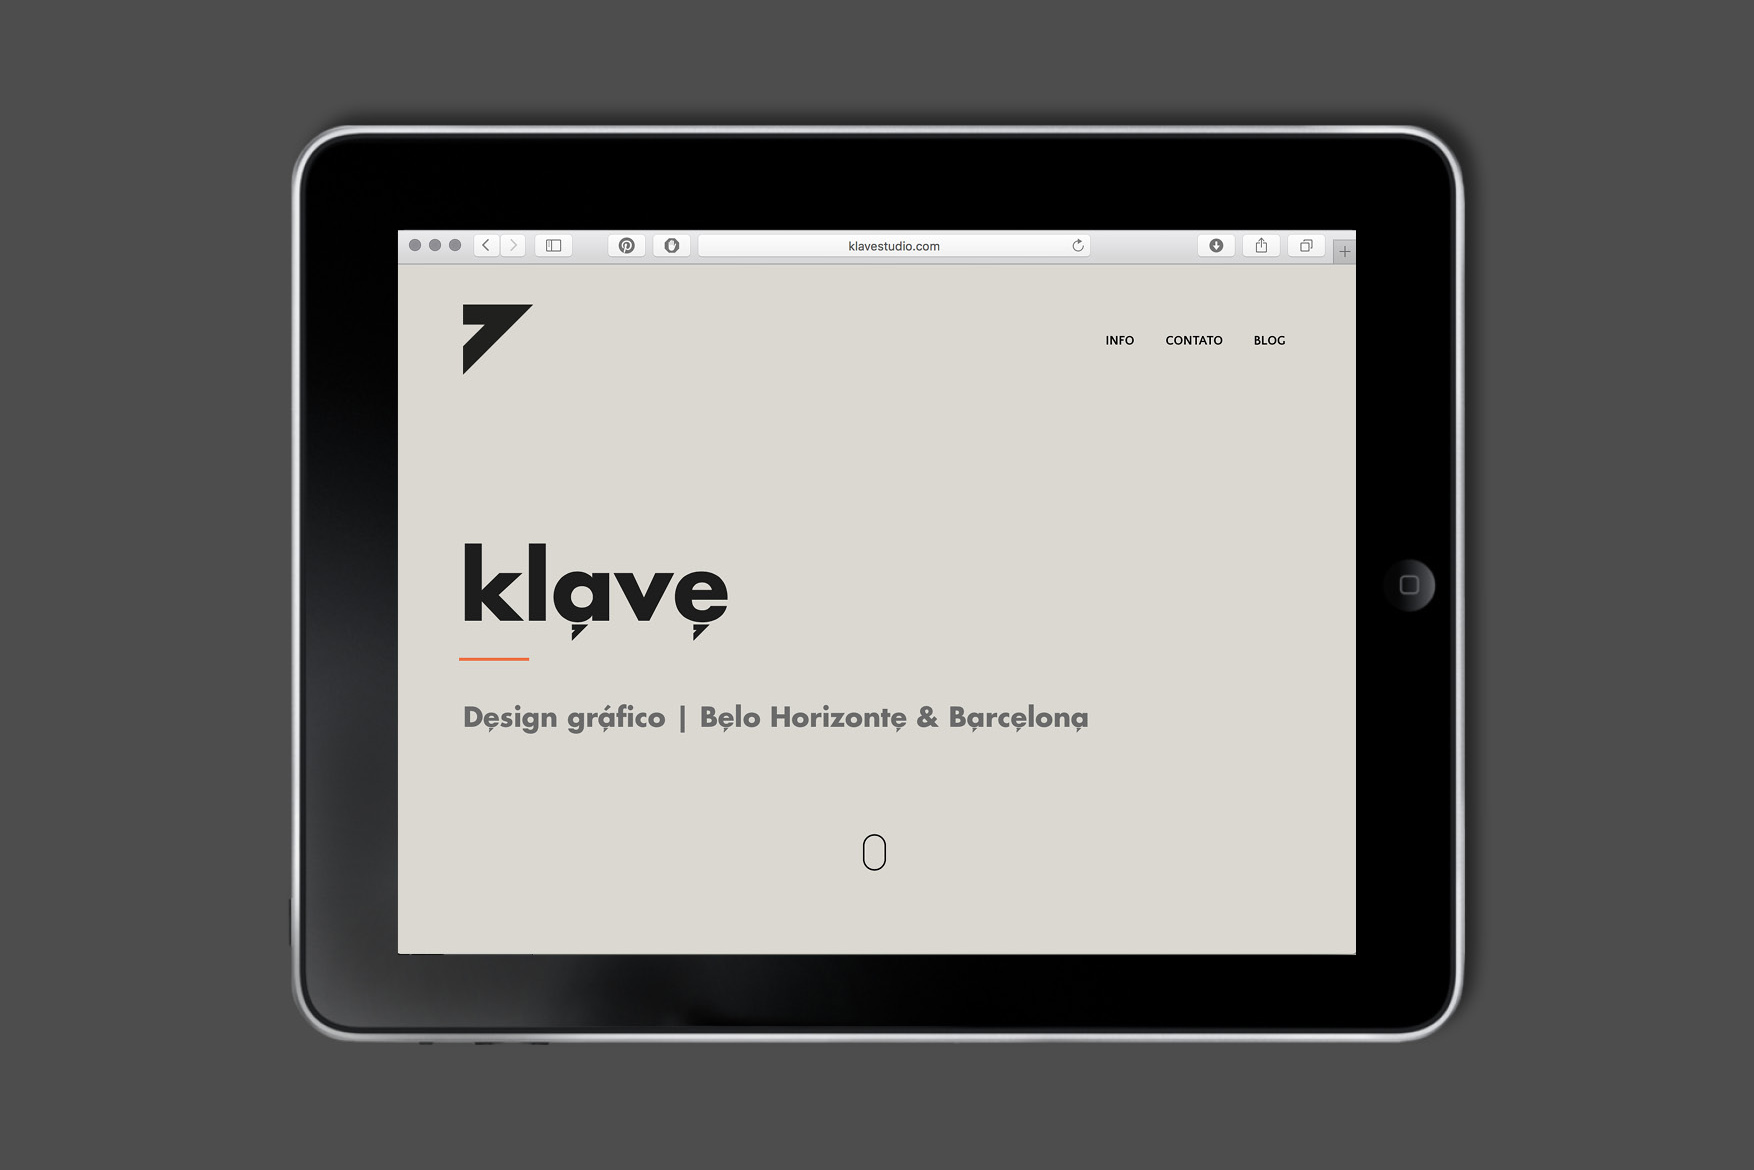 Klave-web-Daniel-Cavalcanti